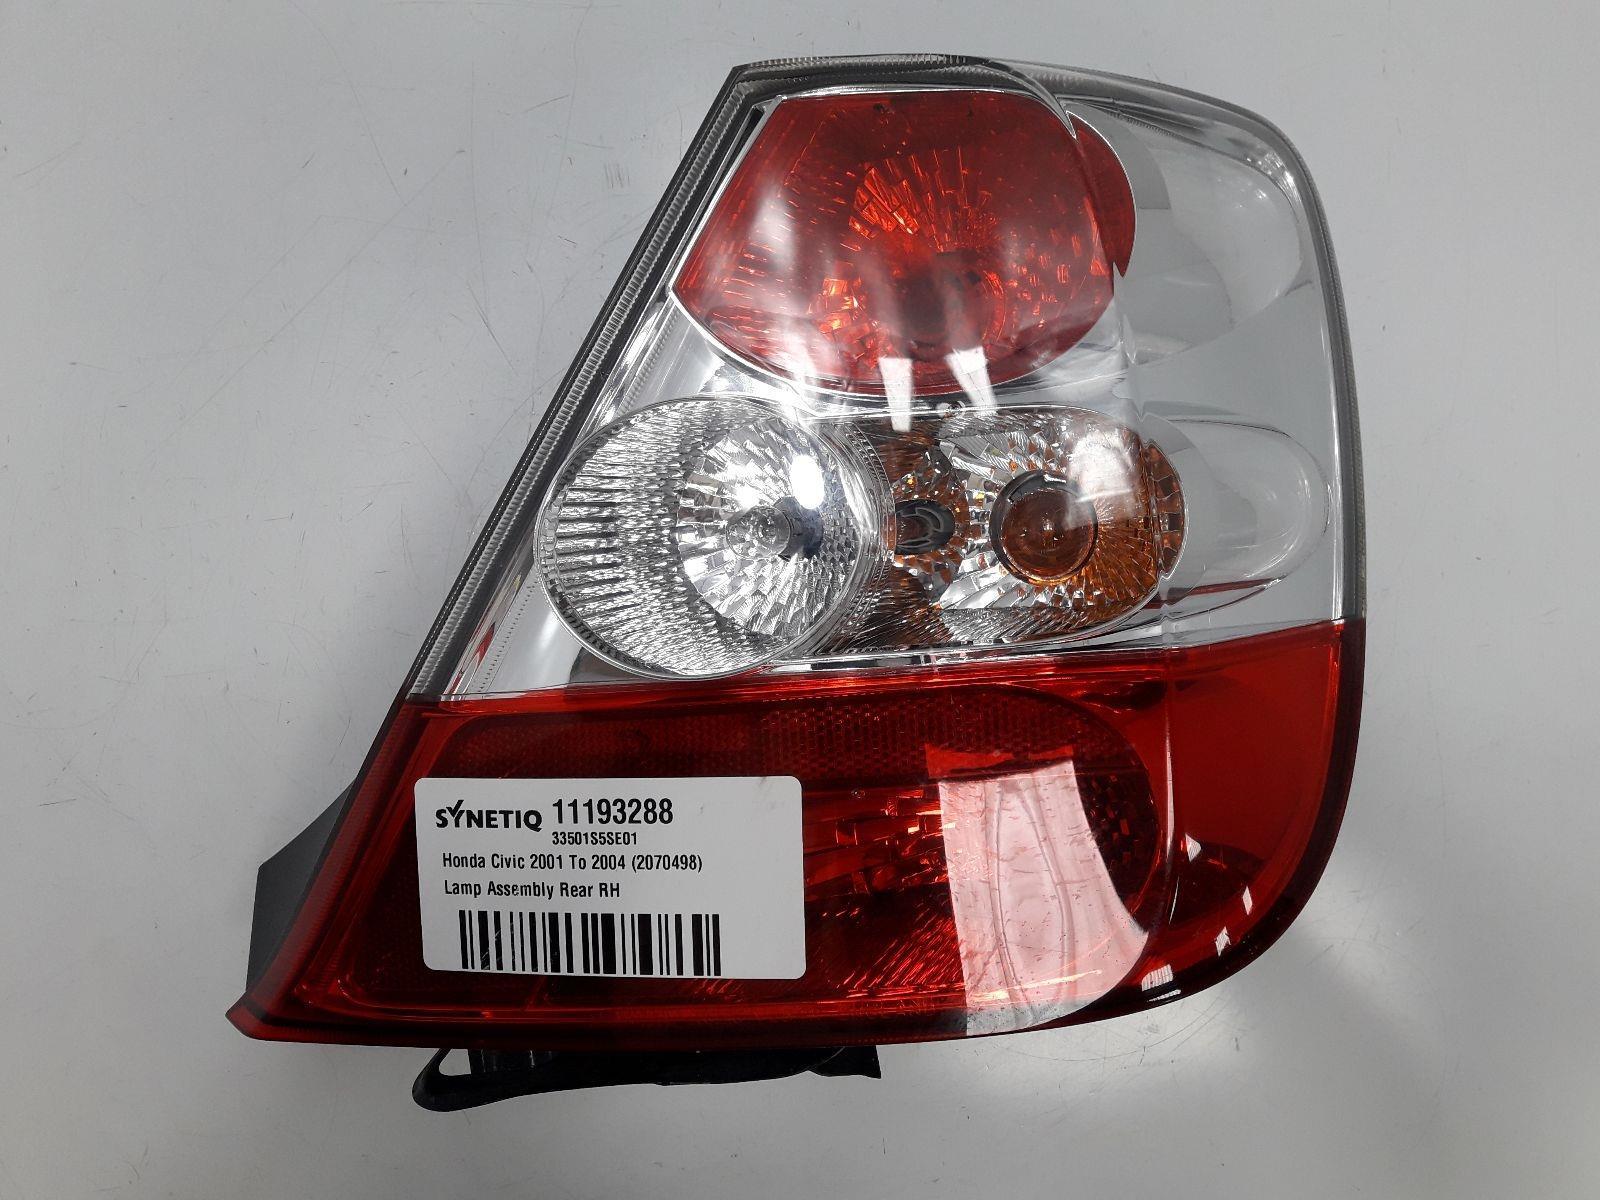 Synetiq Honda Mk7 Ep33 2000 To 2005 Typer Lamp Assembly Rear Rh Petrol Manual For Sale